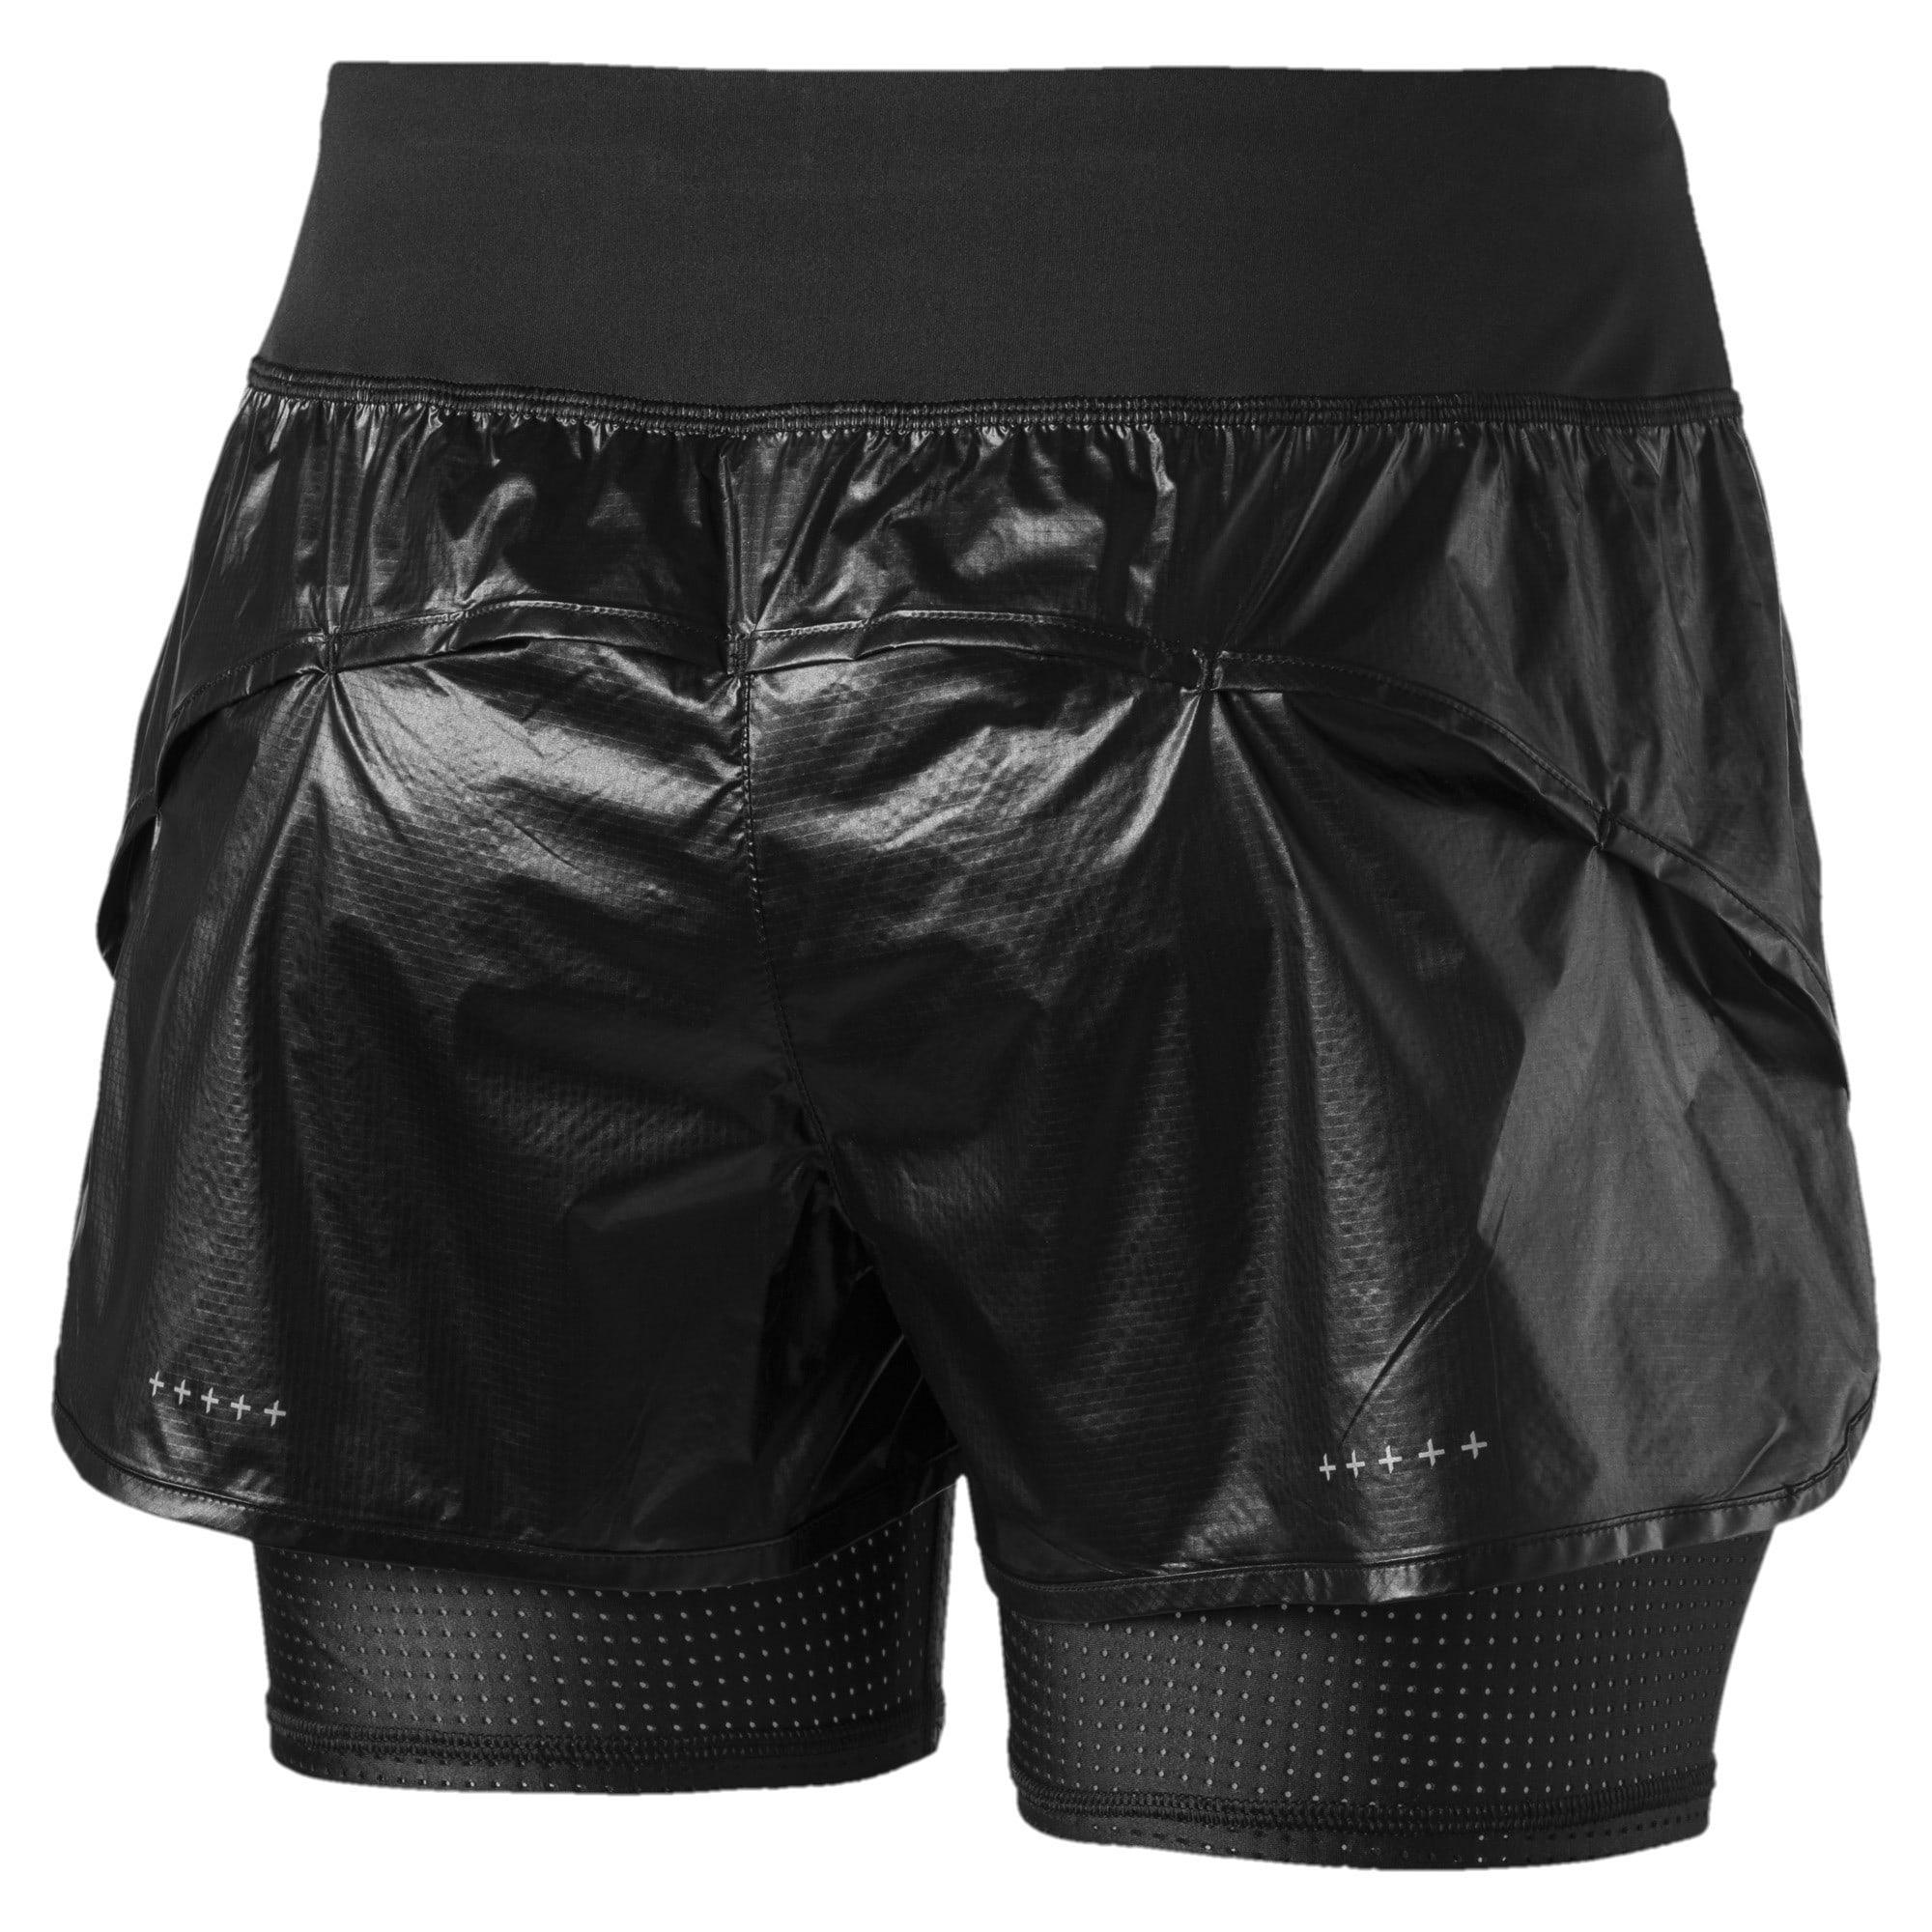 Thumbnail 5 of Blast Woven 2 in 1 Women's Running Shorts, Puma Black-metallic, medium-IND